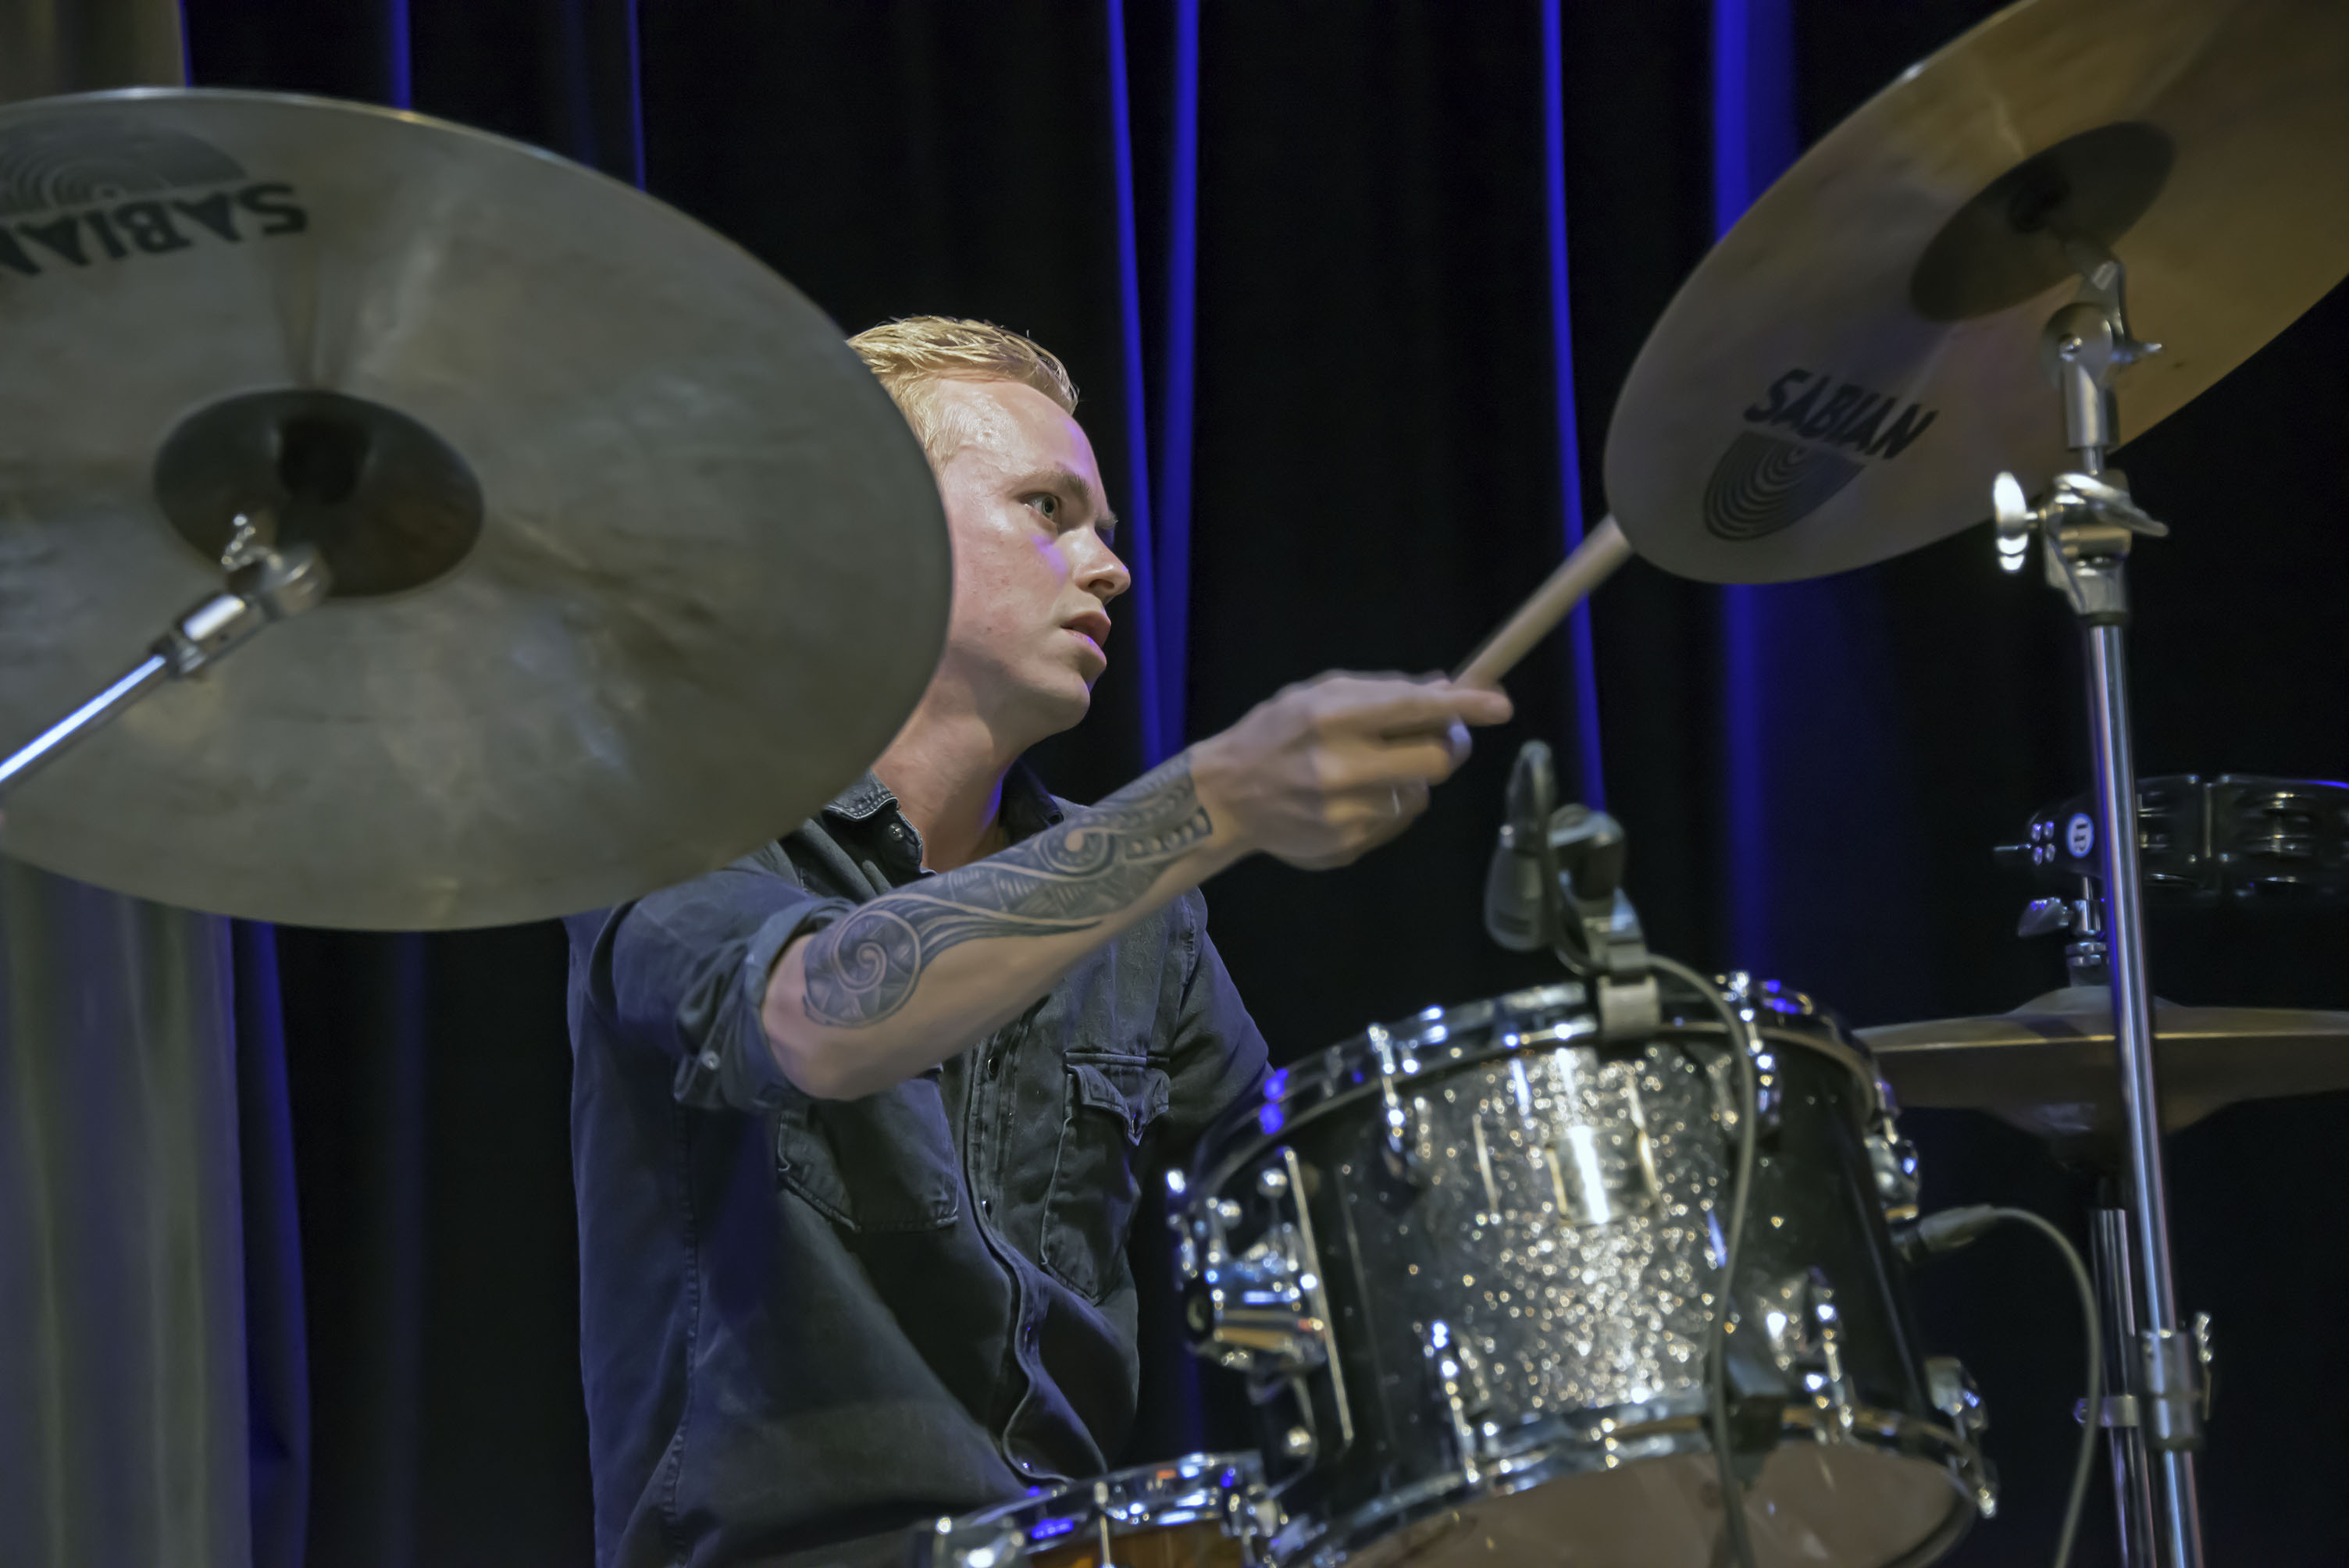 Pelbo, the Jazz Summit 2012